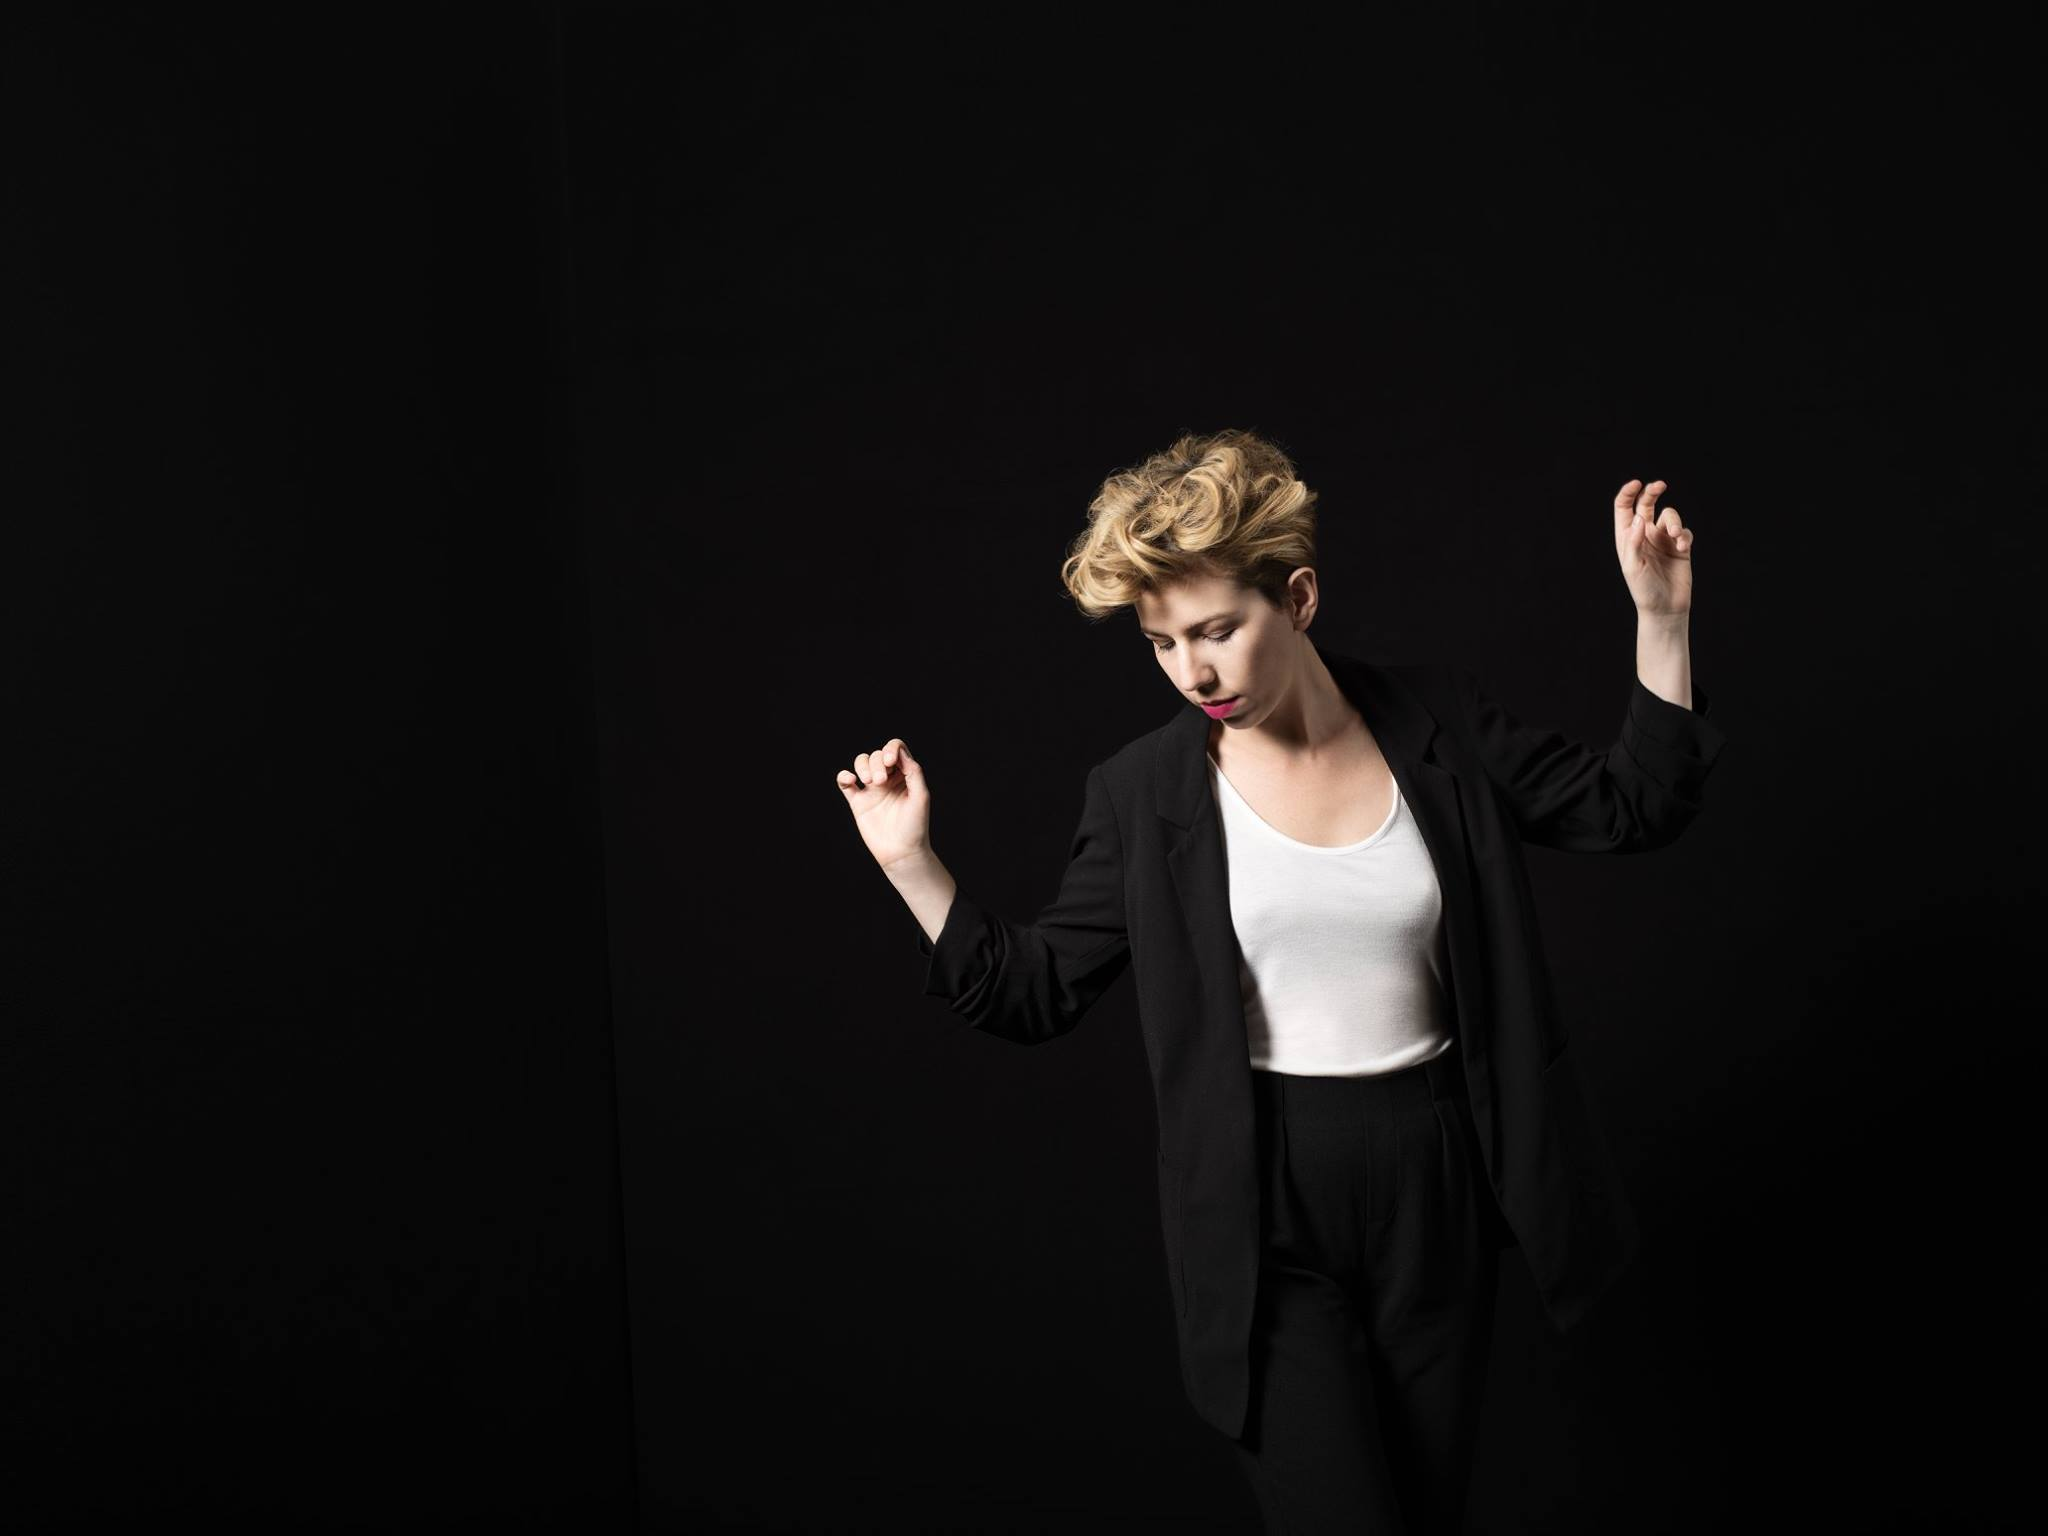 helahoop dances (c) Elsa Okazaki.jpg